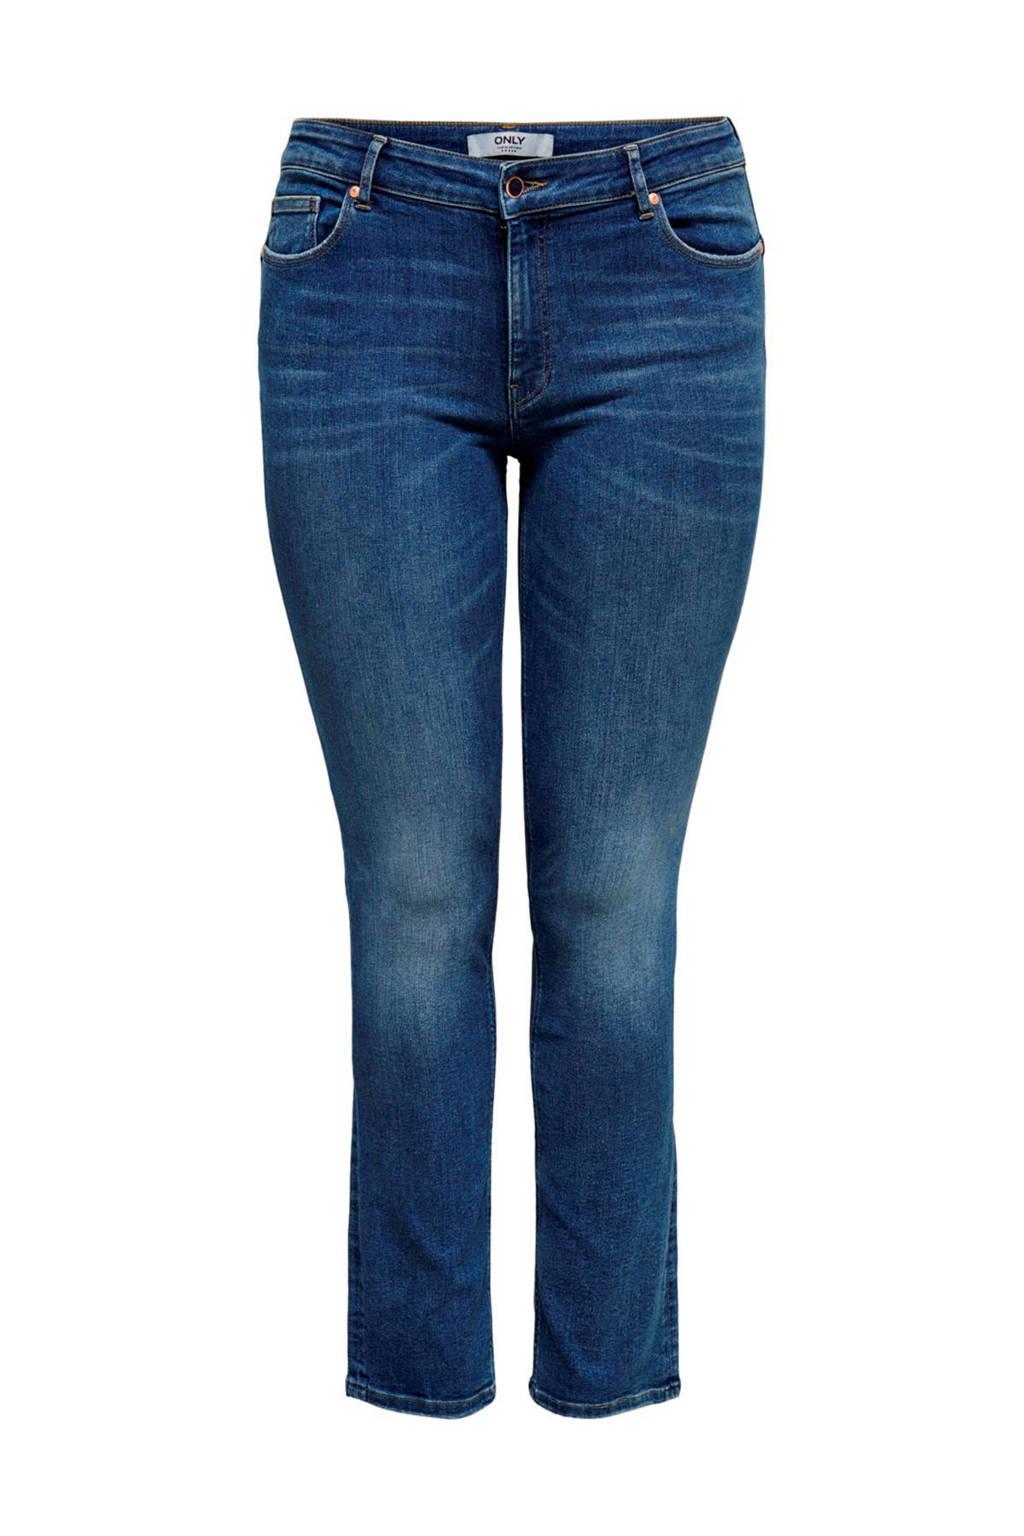 ONLY CARMAKOMA slim fit jeans blauw, Blauw